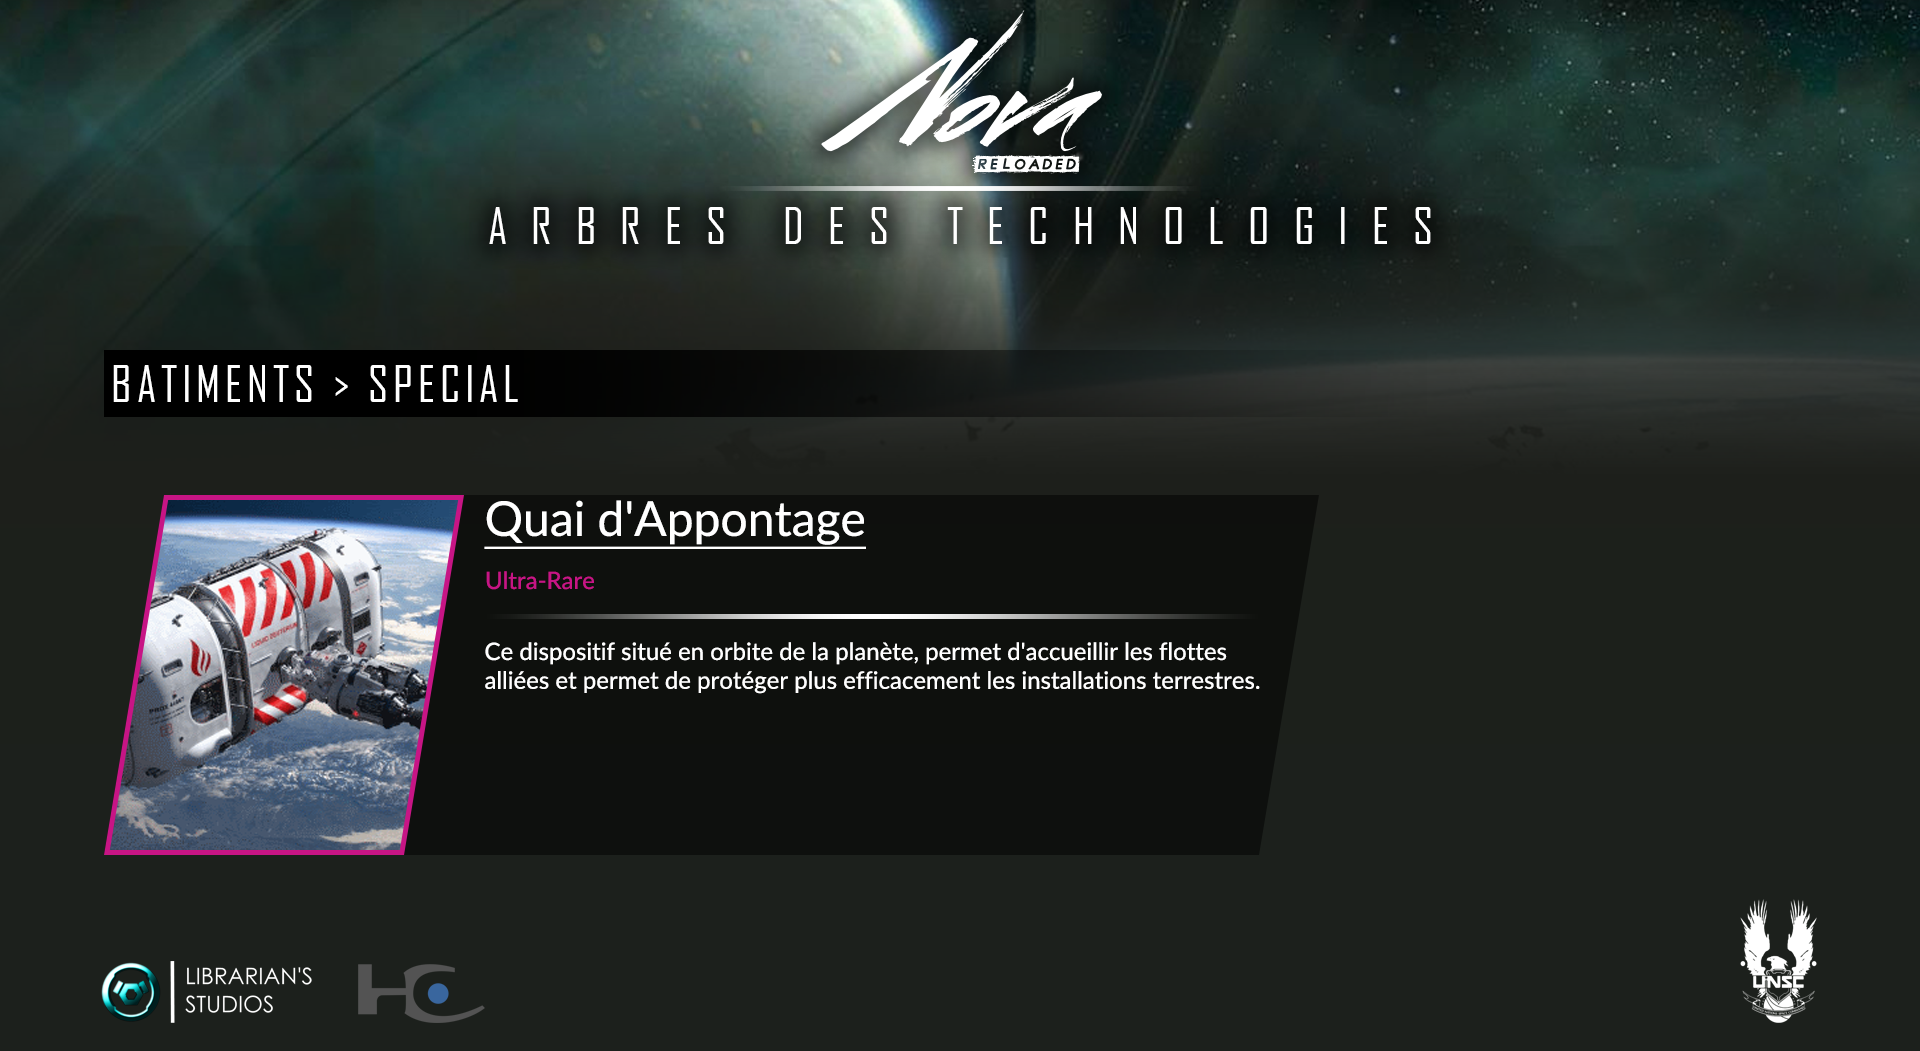 Space Territory #4.1 : Arbre Technologique CSNU : Bâtiments Specia10